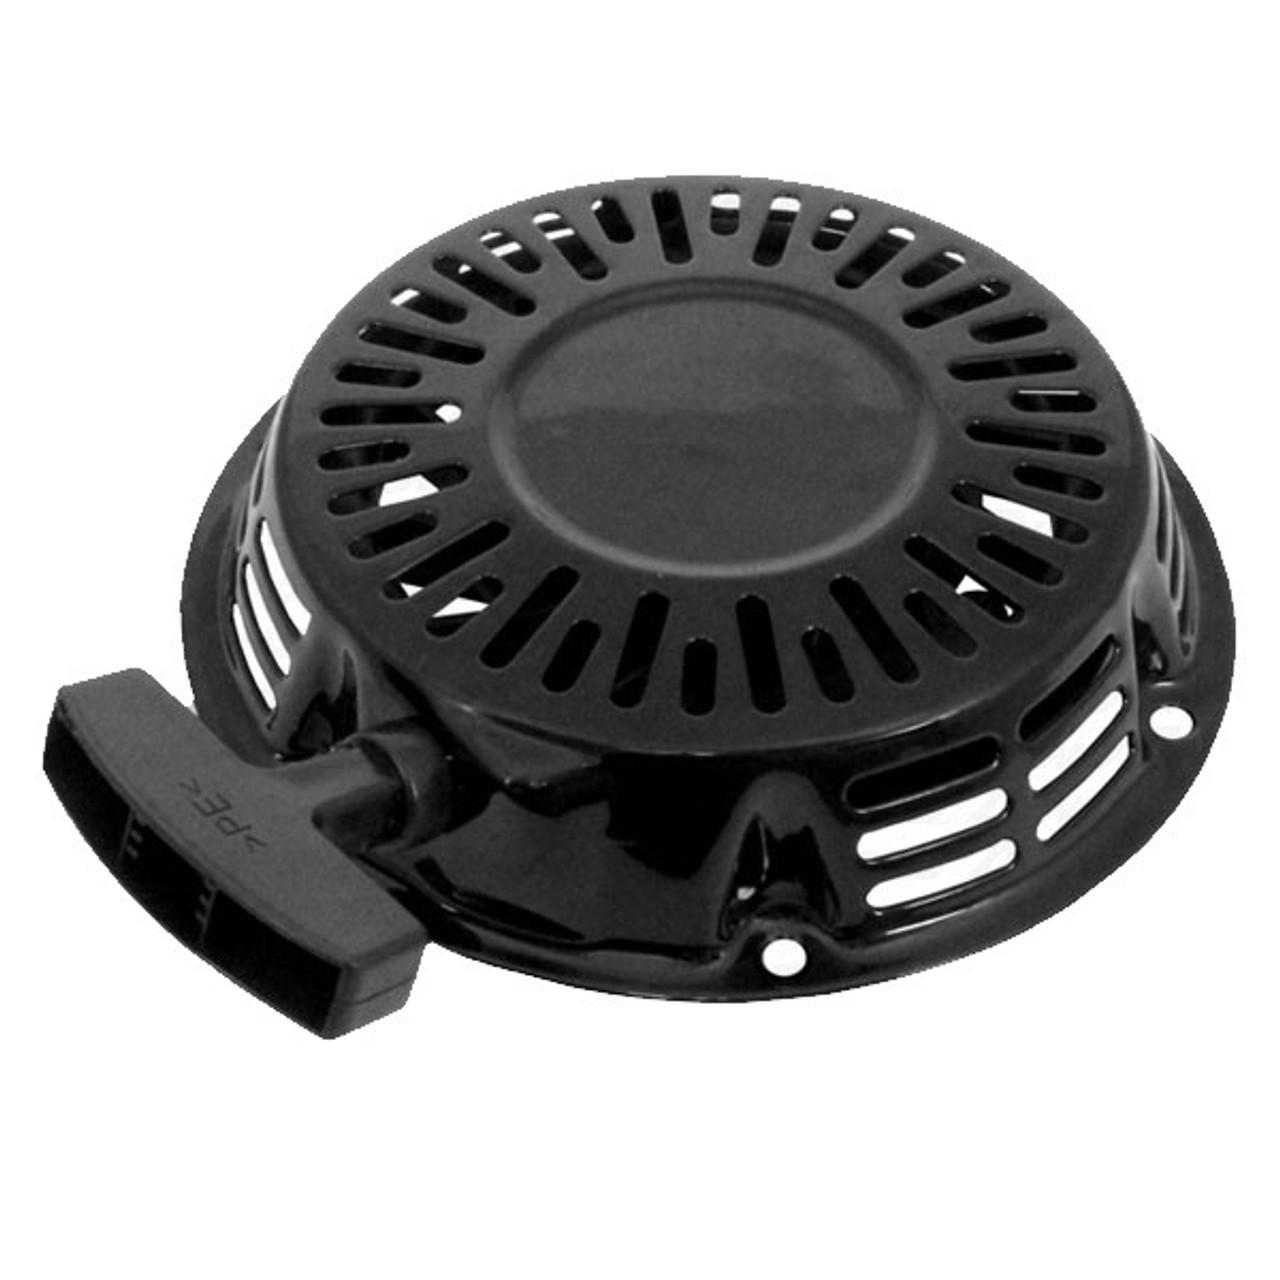 DJ-1190B 6.5 Hp OHV Black Clone Starter Recoil Assembly